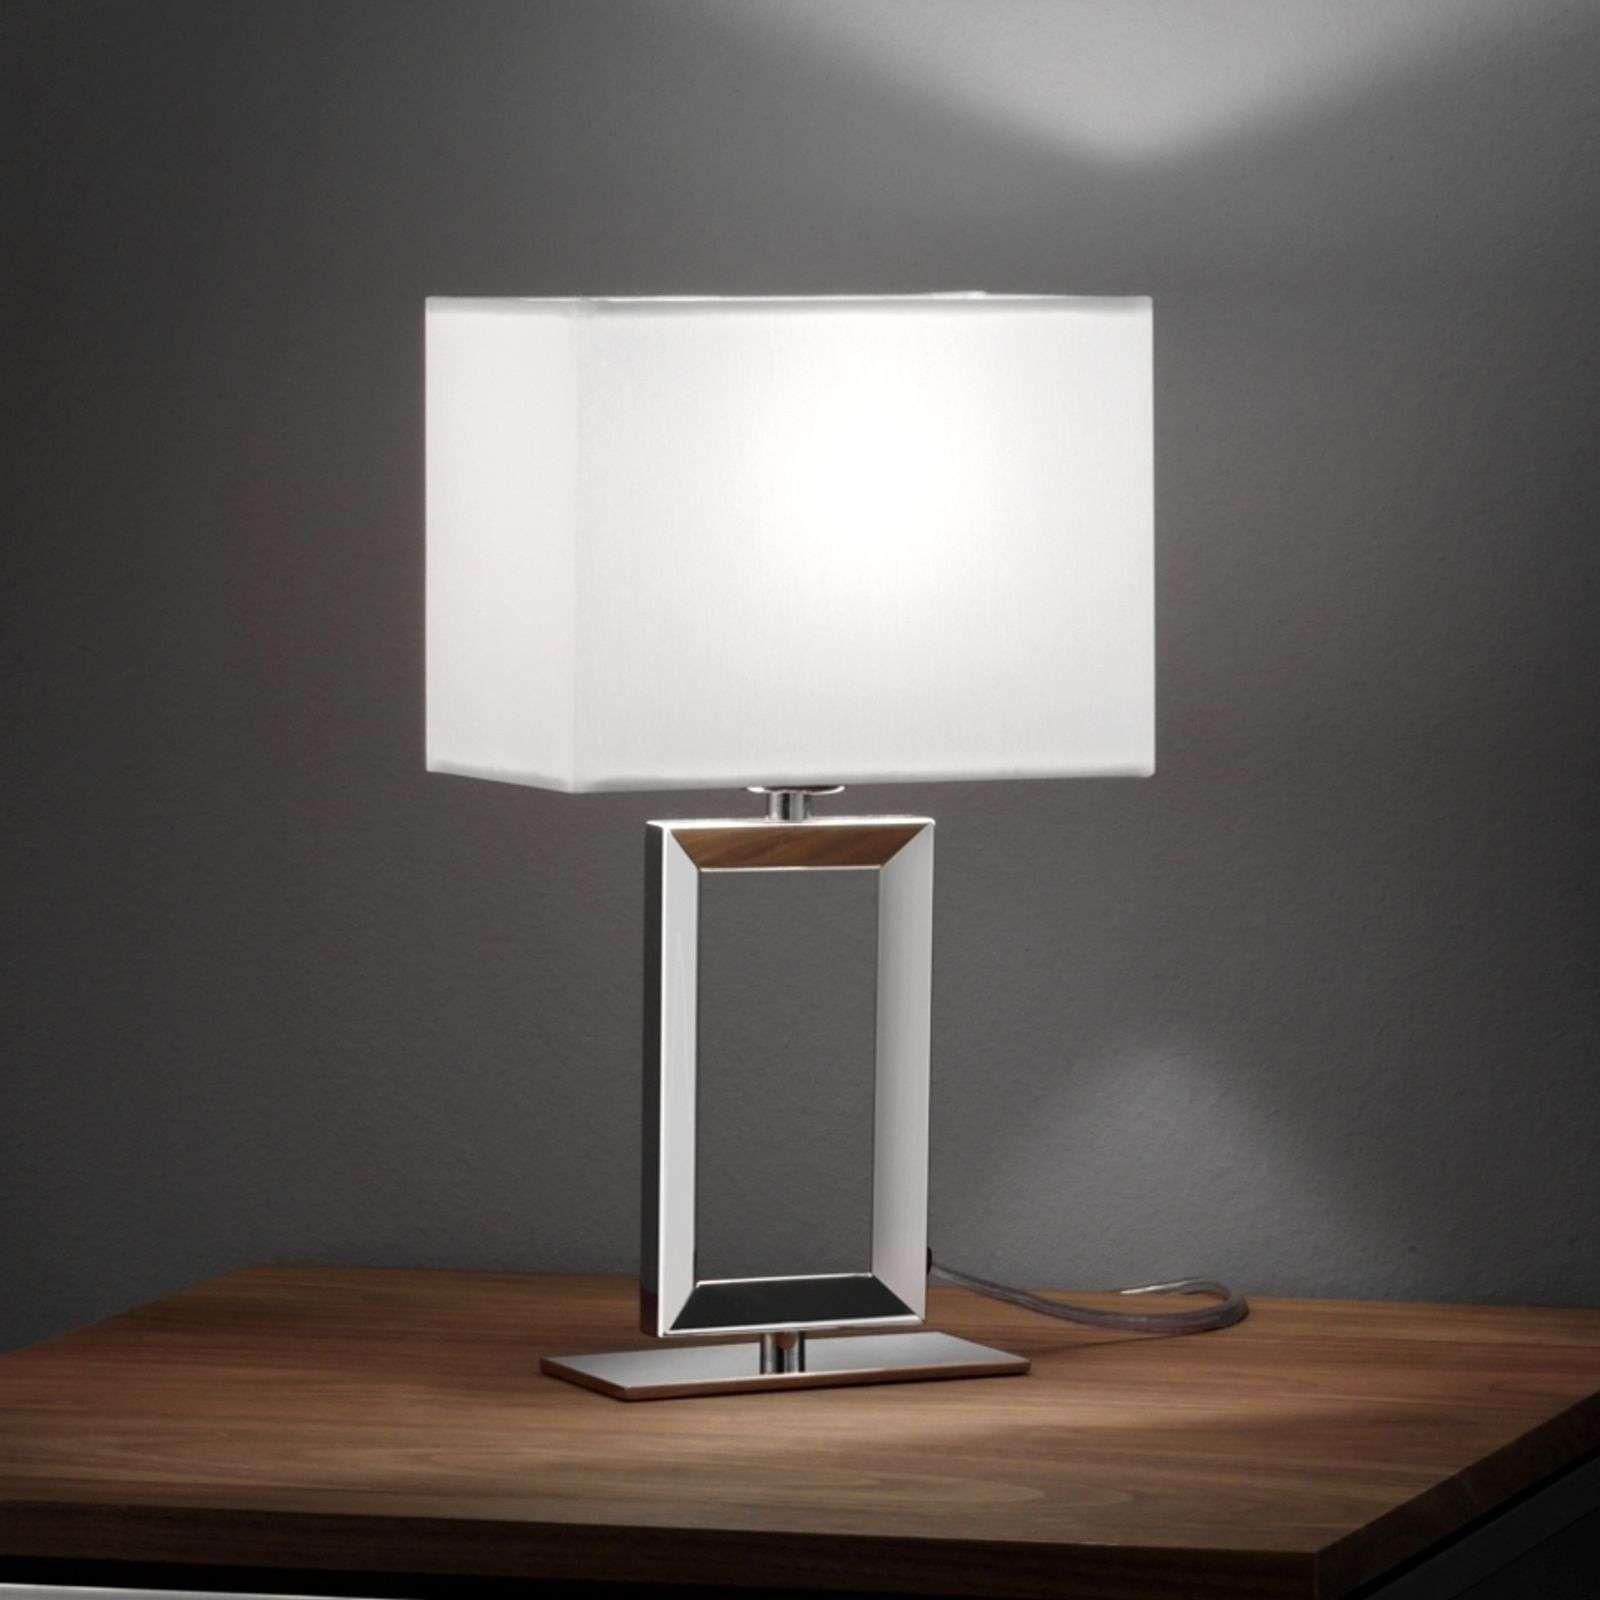 Lampe A Poser Moderne Enna 2 Lampe A Poser Lumiere De Lampe Et